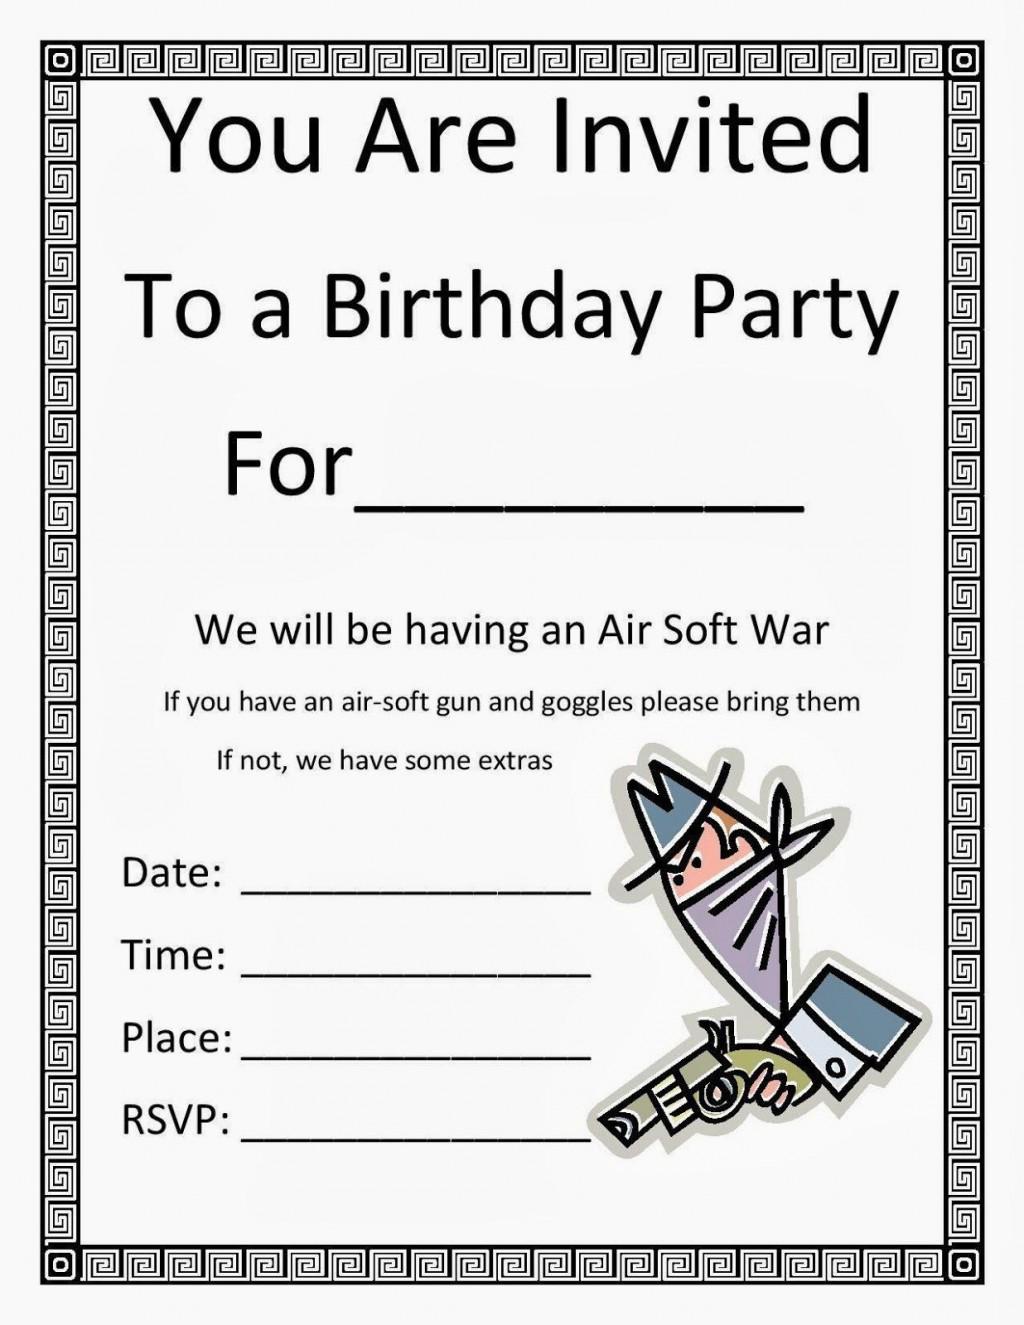 000 Marvelou Microsoft Word Birthday Invitation Template Sample  Editable 50th 60thLarge